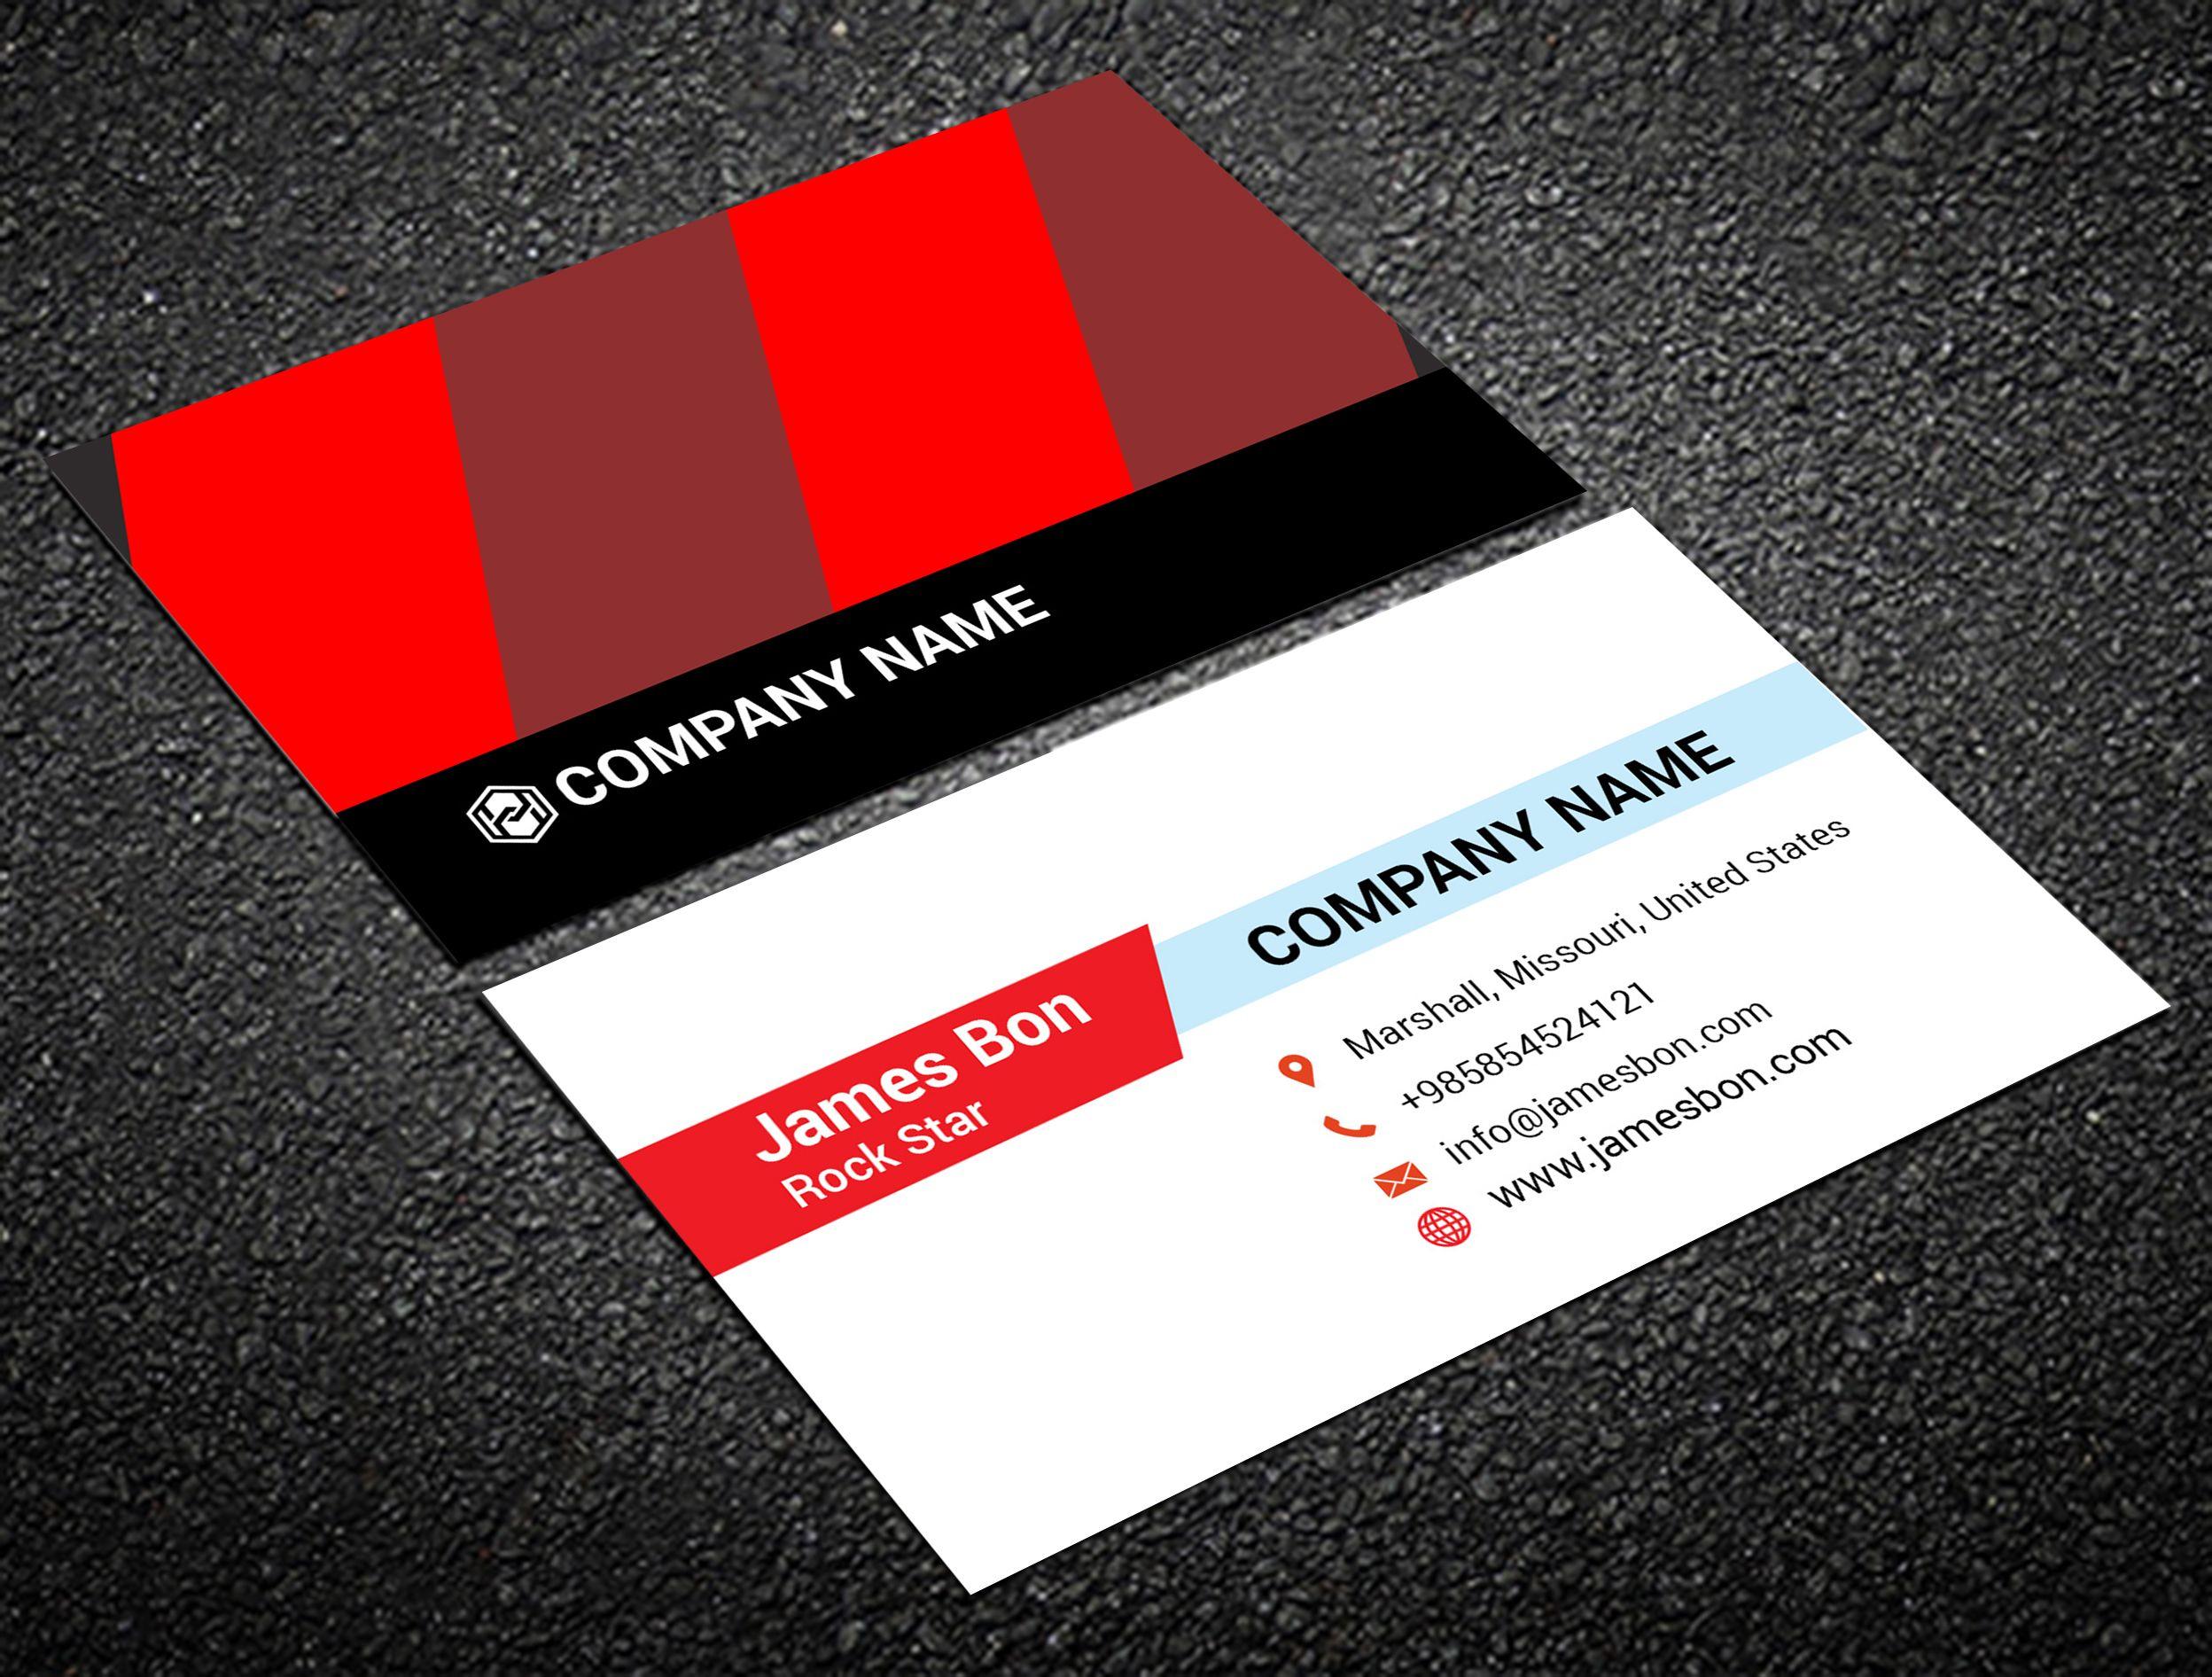 Do design amazing business cards, postcards, letterhead | Business ...